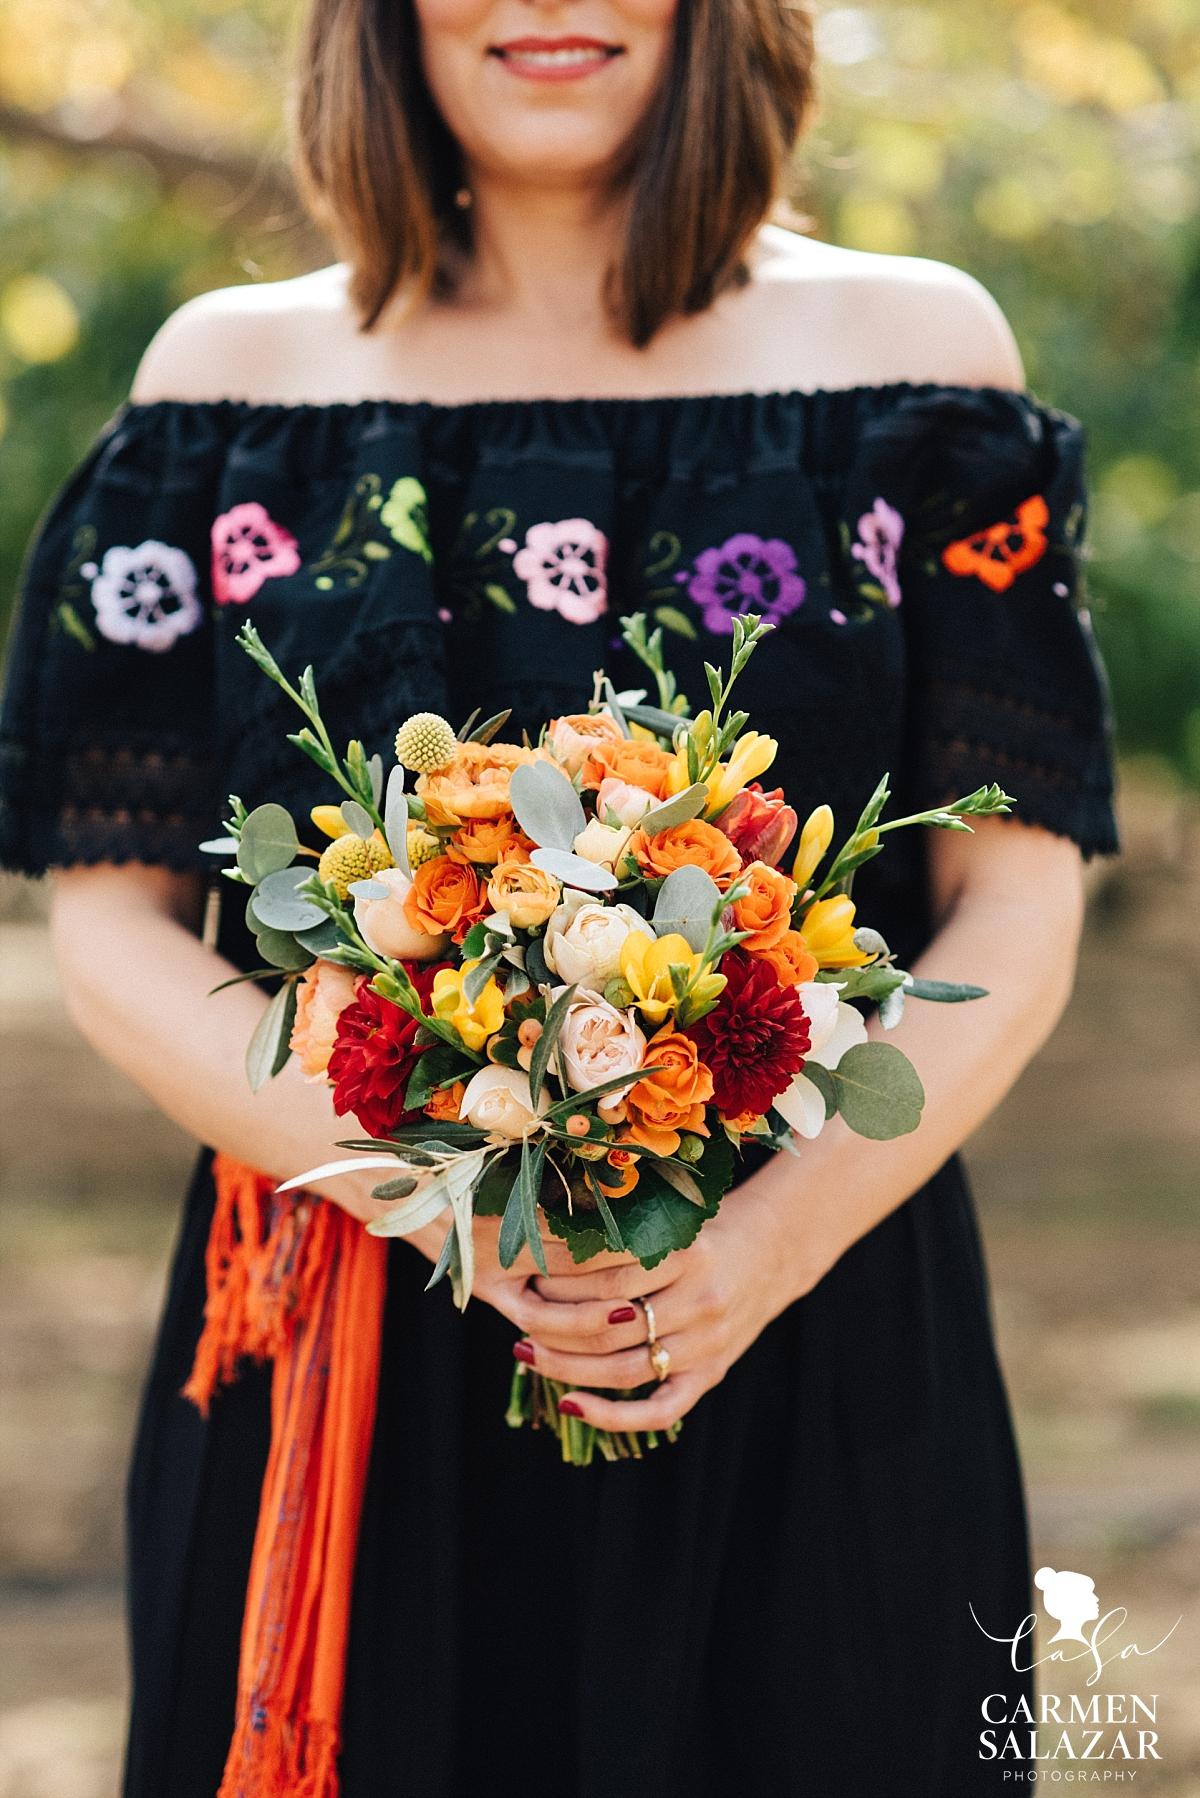 Mexican wedding style bouquet - Carmen Salazar